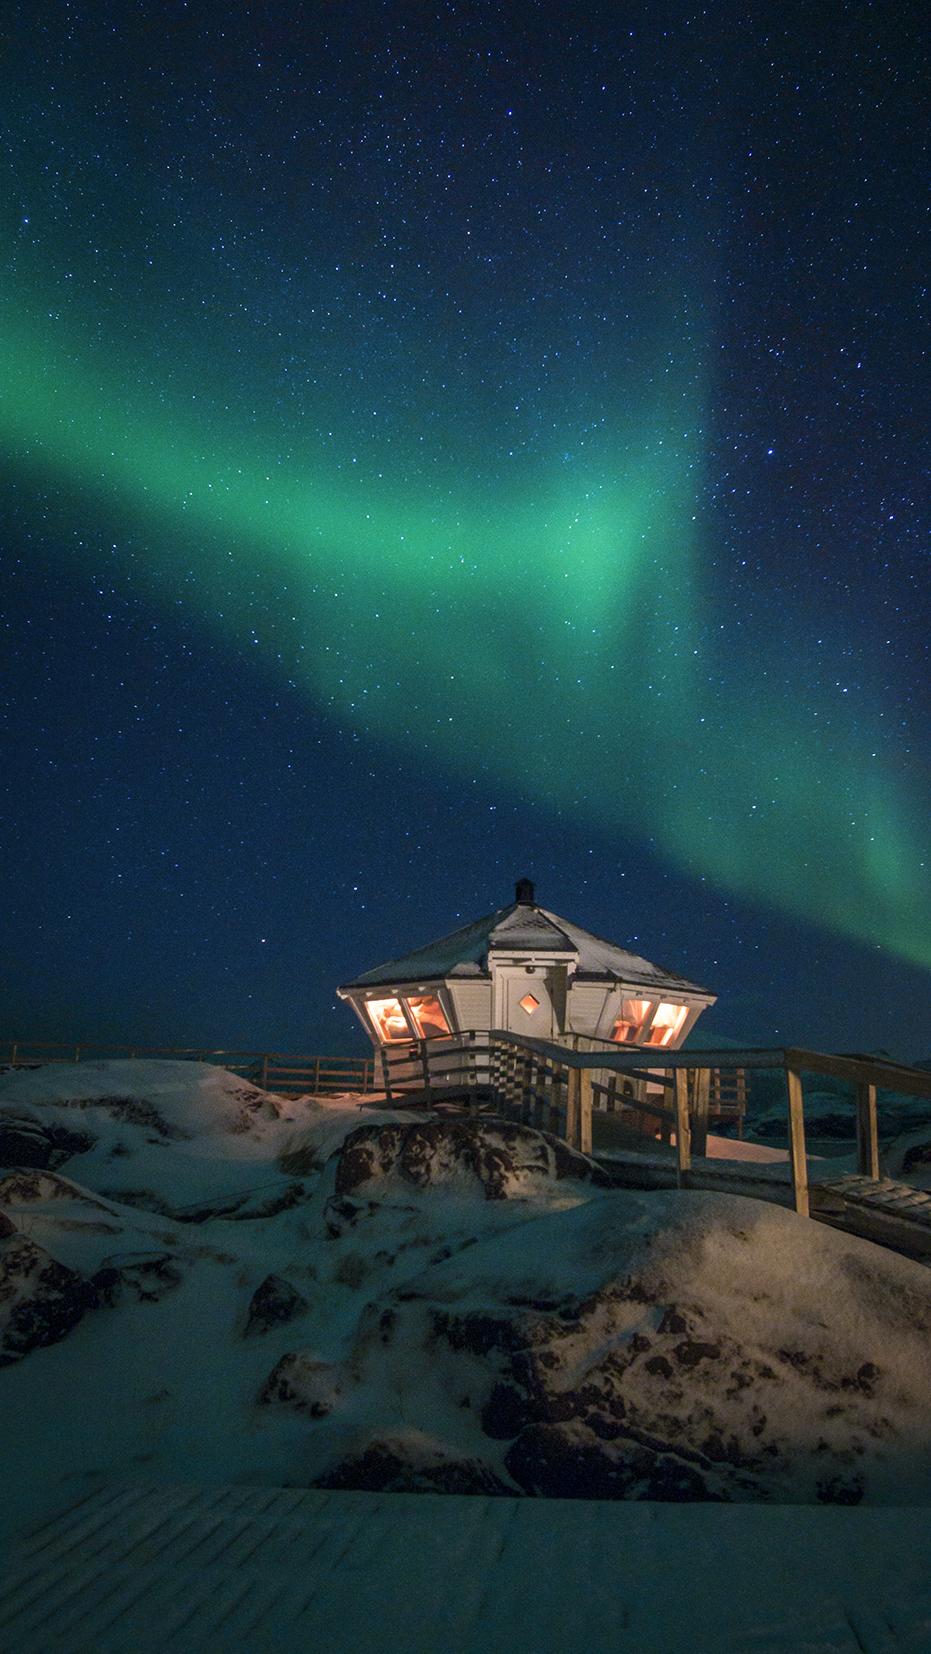 Senja phare neige étoiles aurore boréale